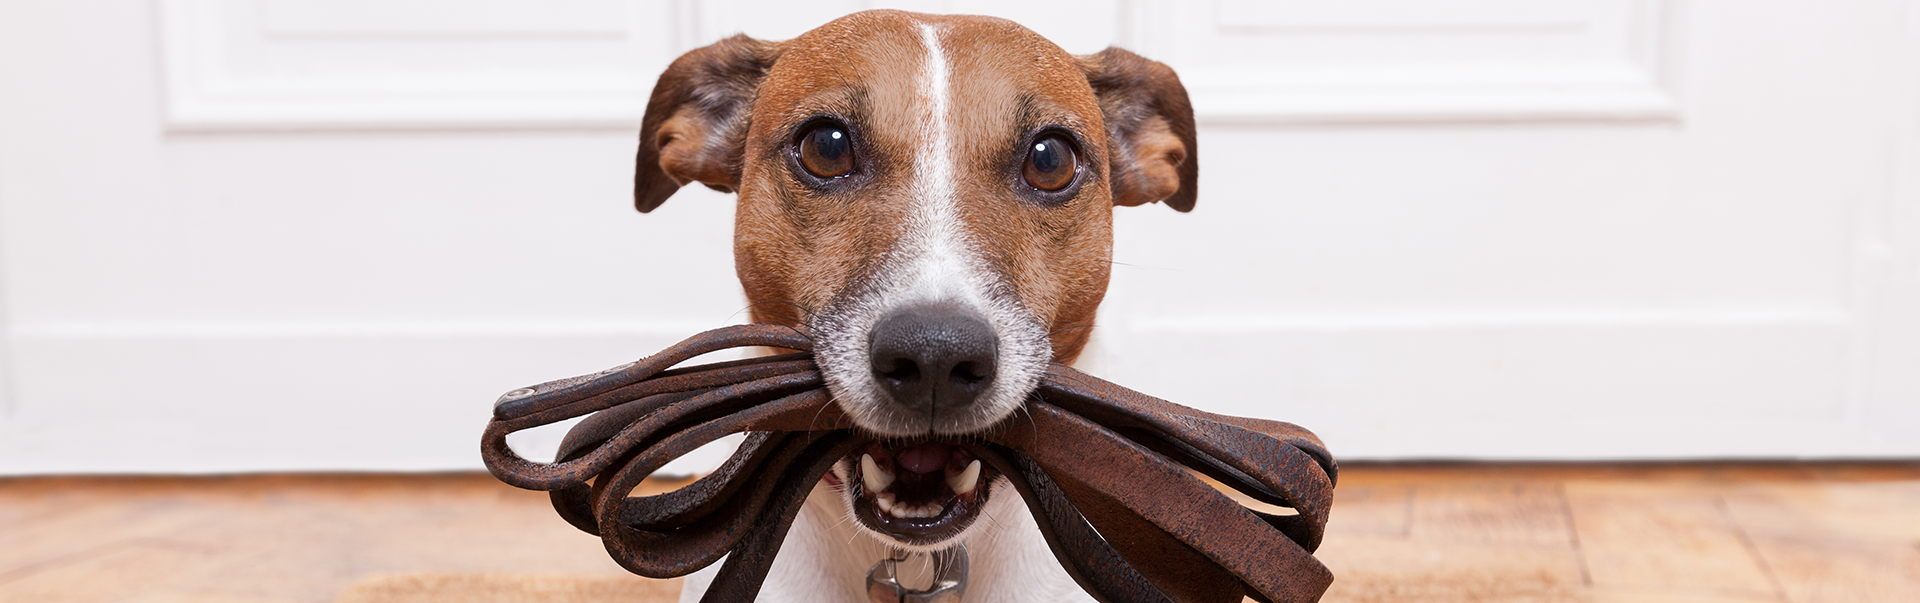 Pet Surgery Veterinarian Academy Animal Hospital Greenwood Indianapolis Indiana